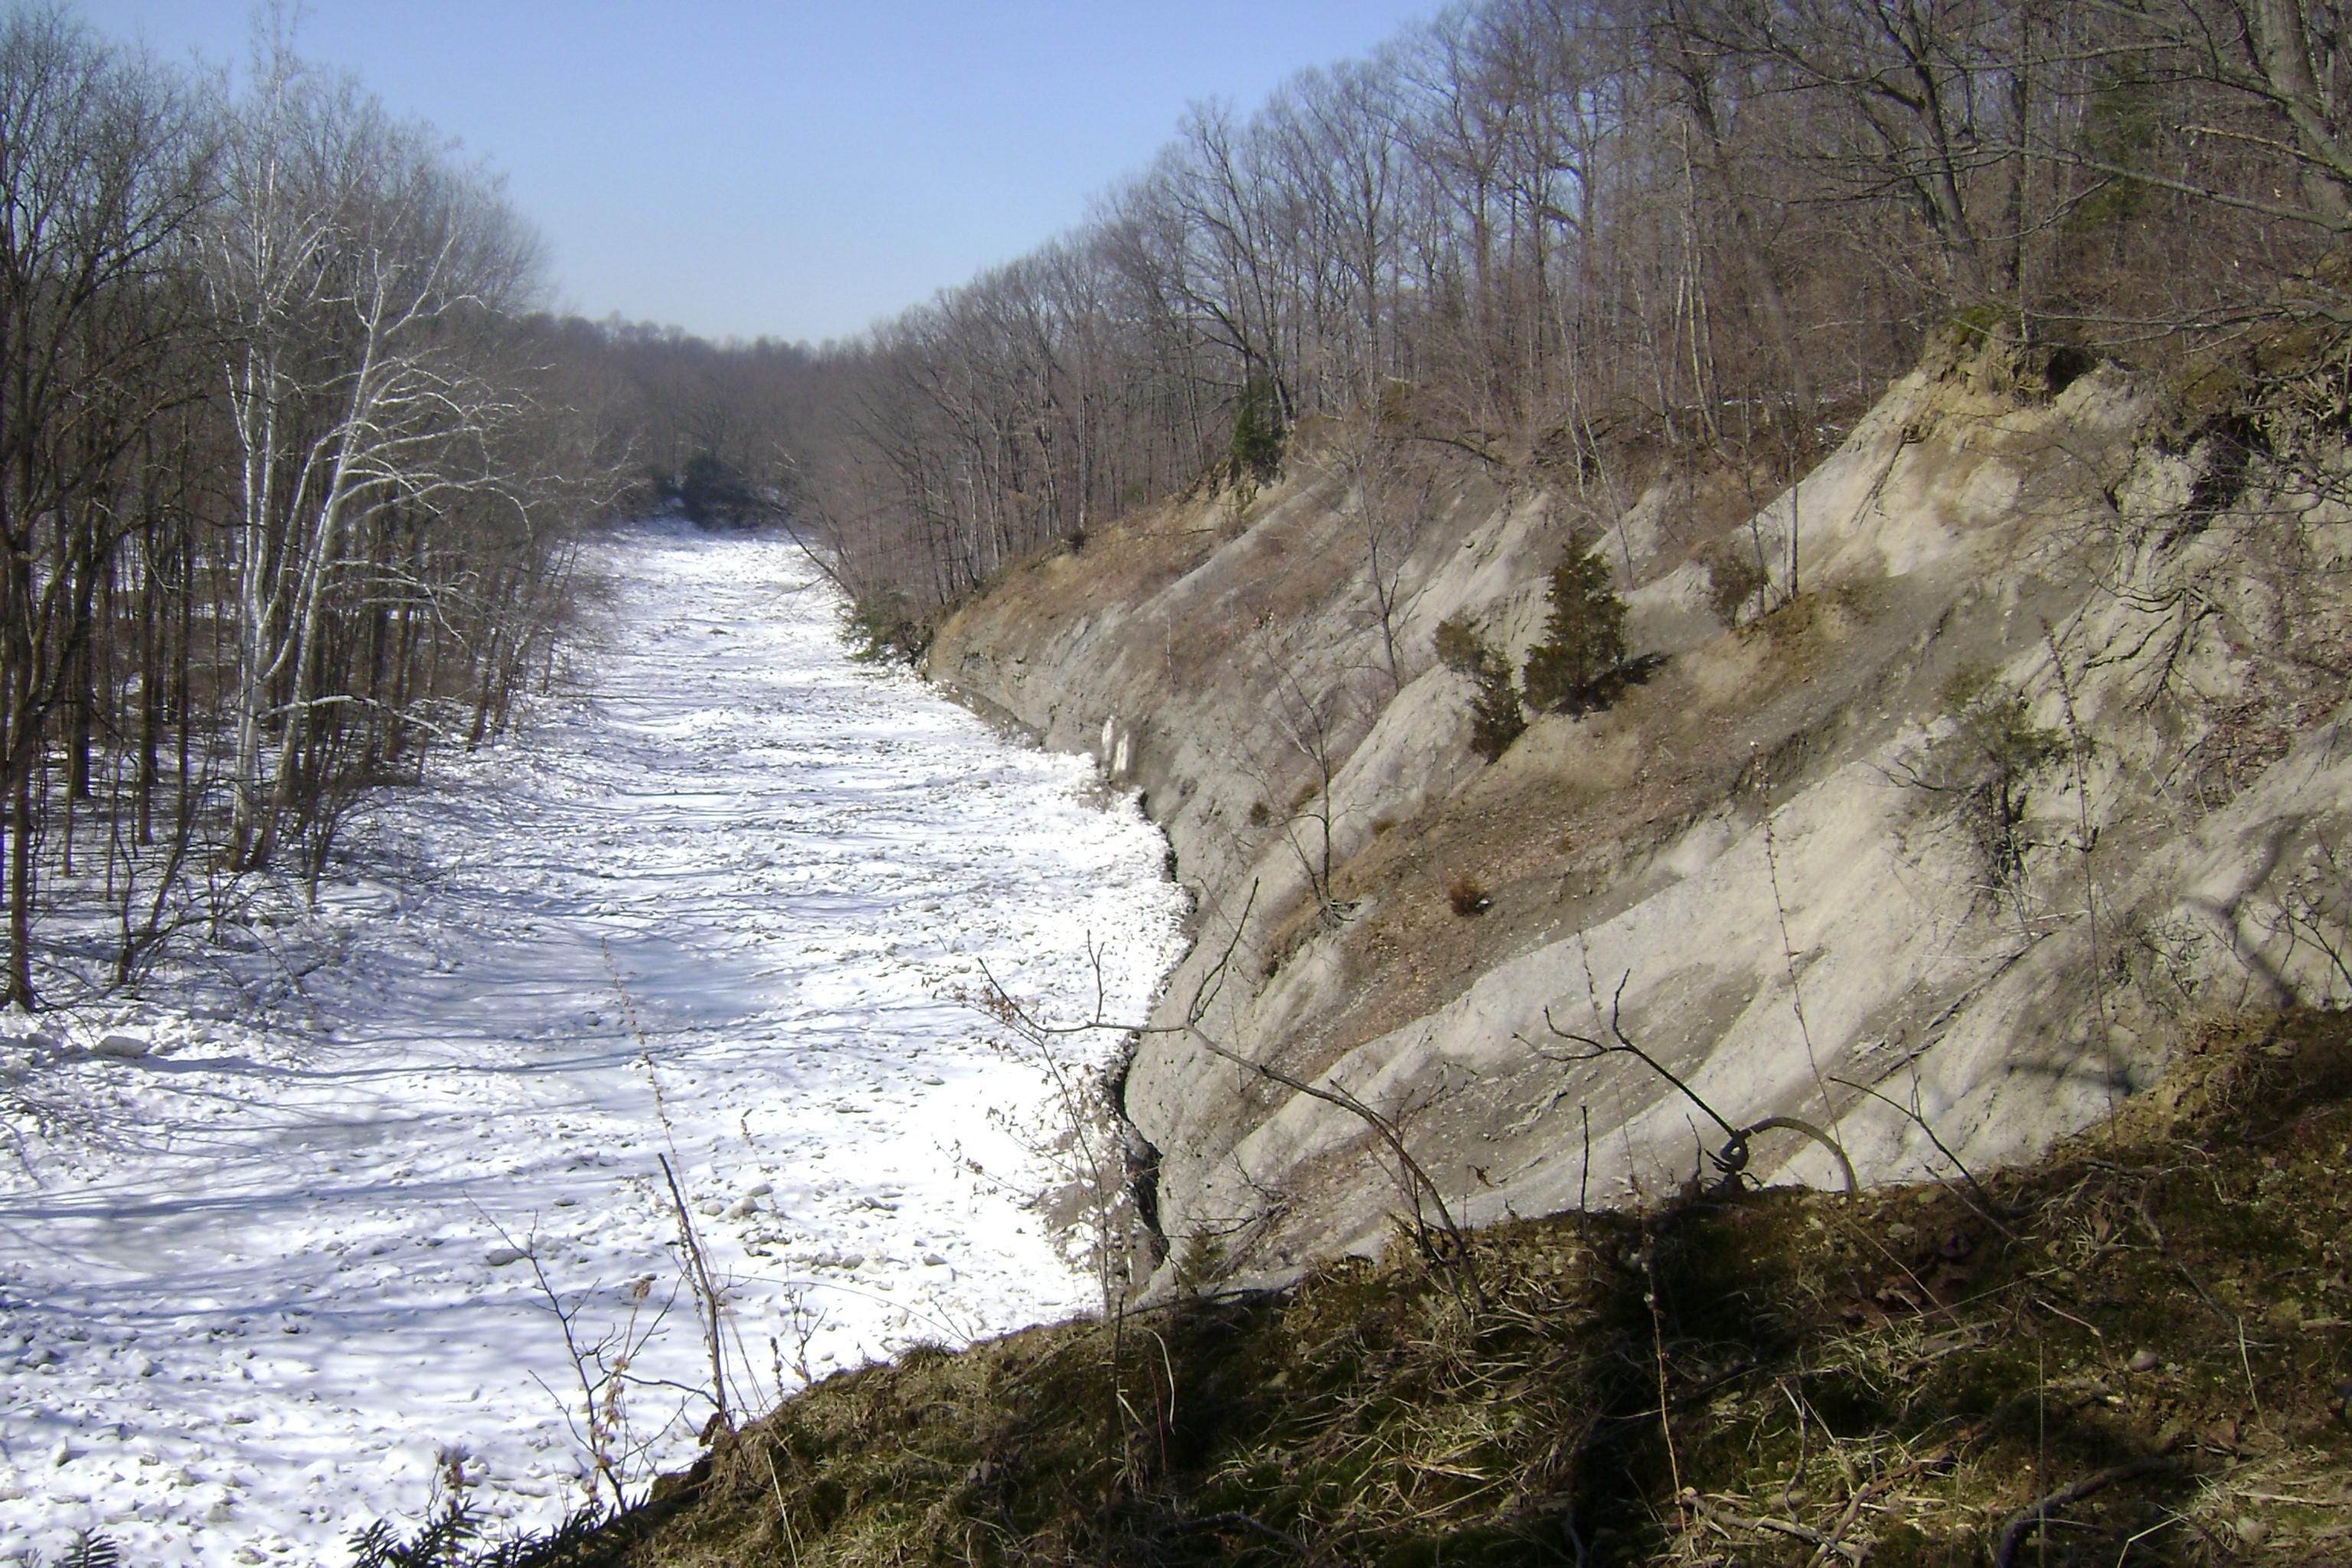 photo depicting Elk Creek Girarard Township, PA in winter